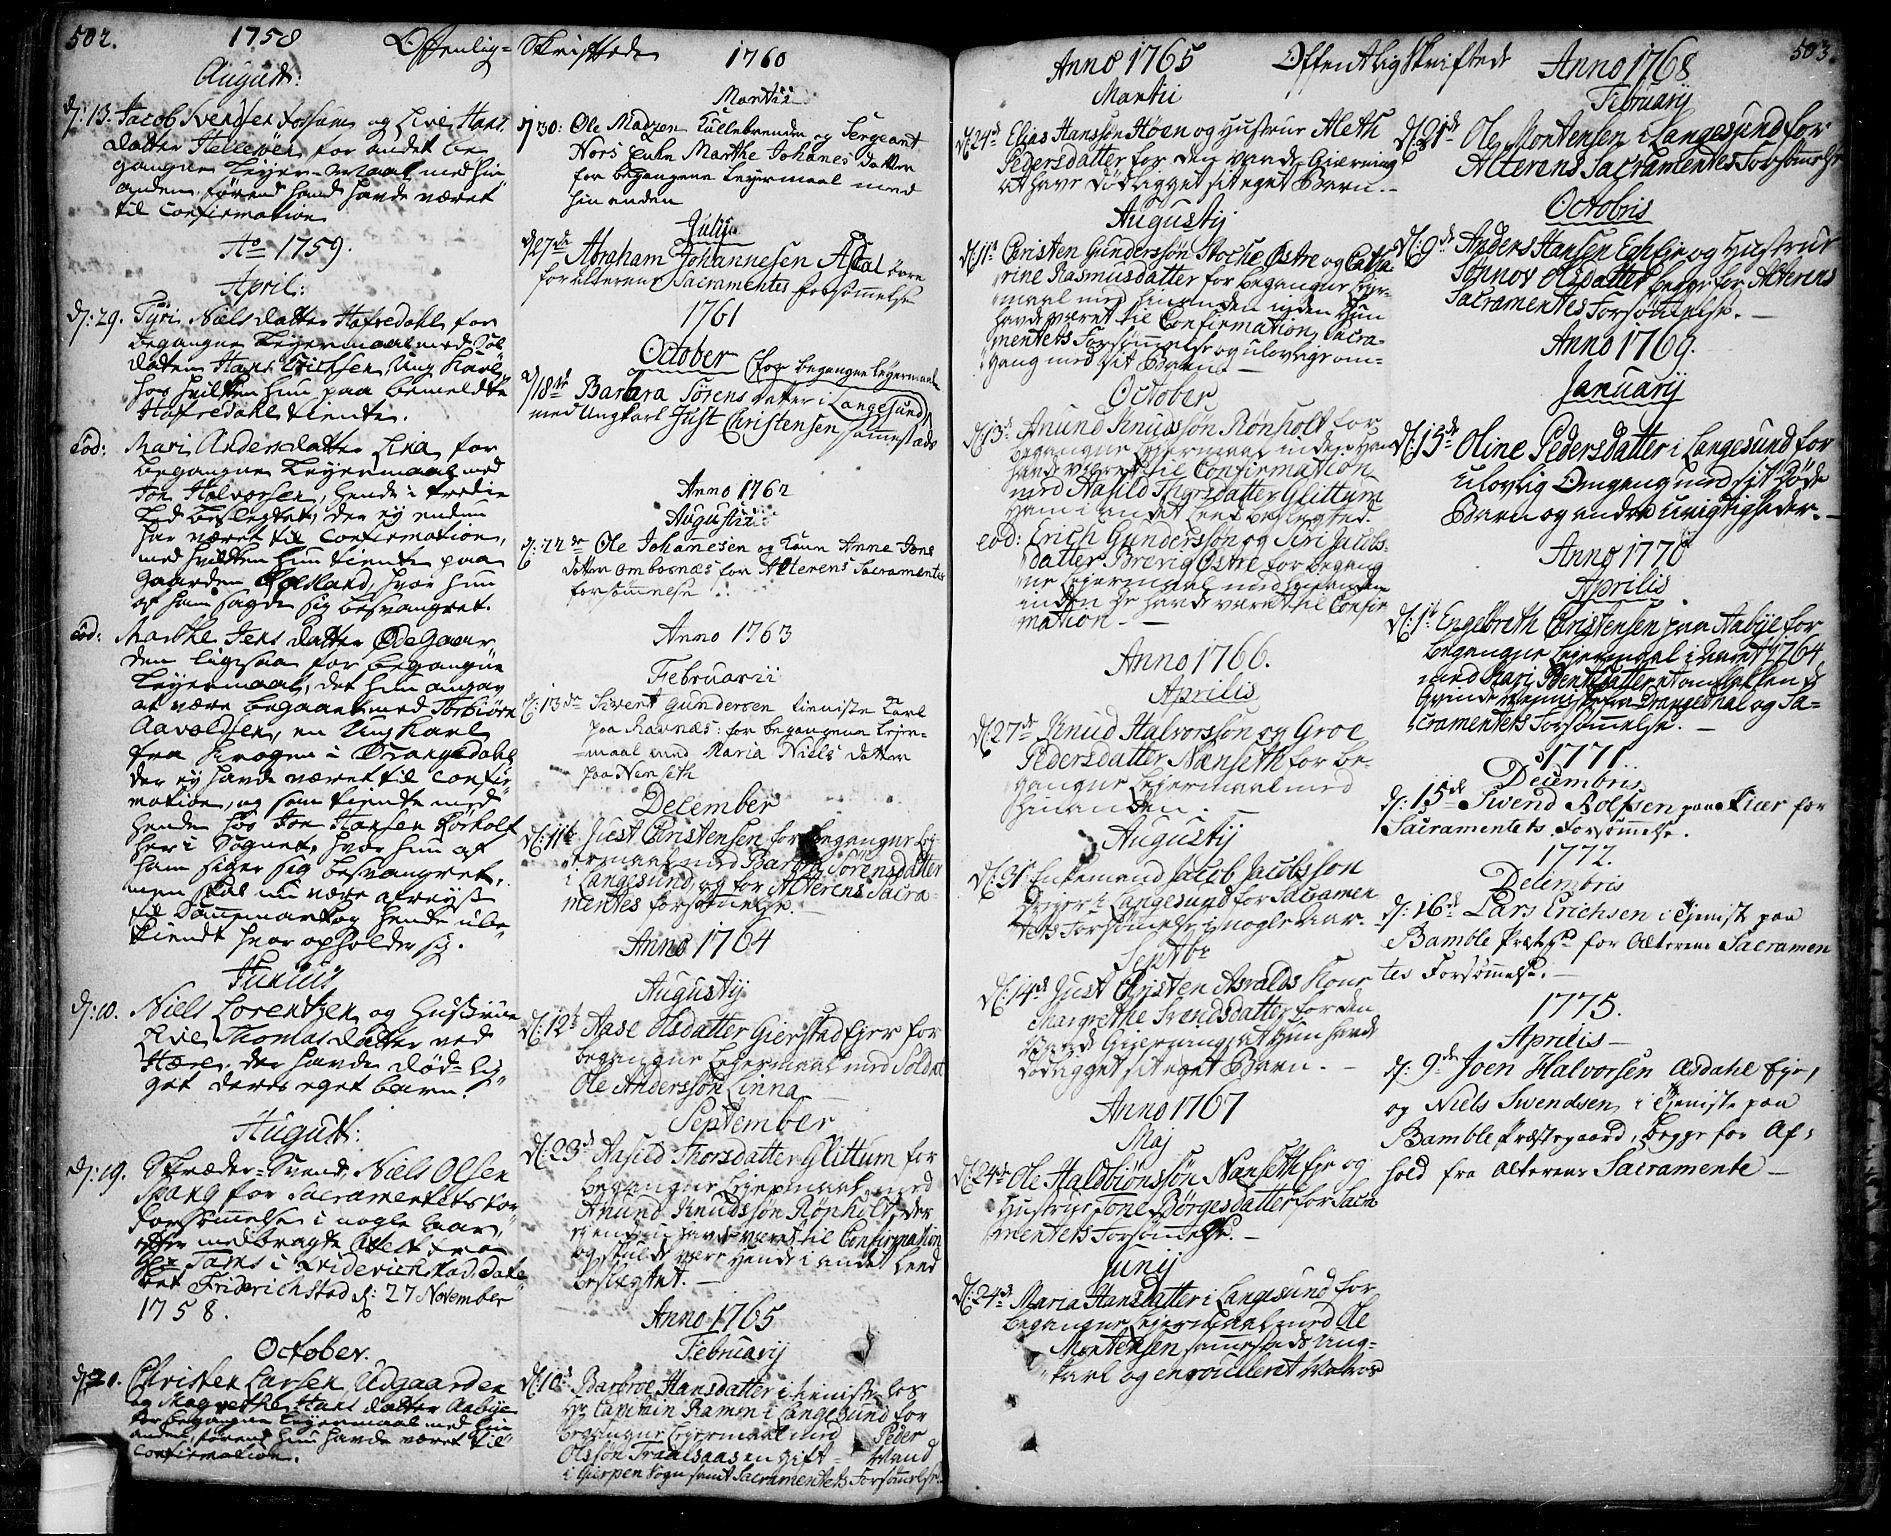 SAKO, Bamble kirkebøker, F/Fa/L0001: Ministerialbok nr. I 1, 1702-1774, s. 502-503